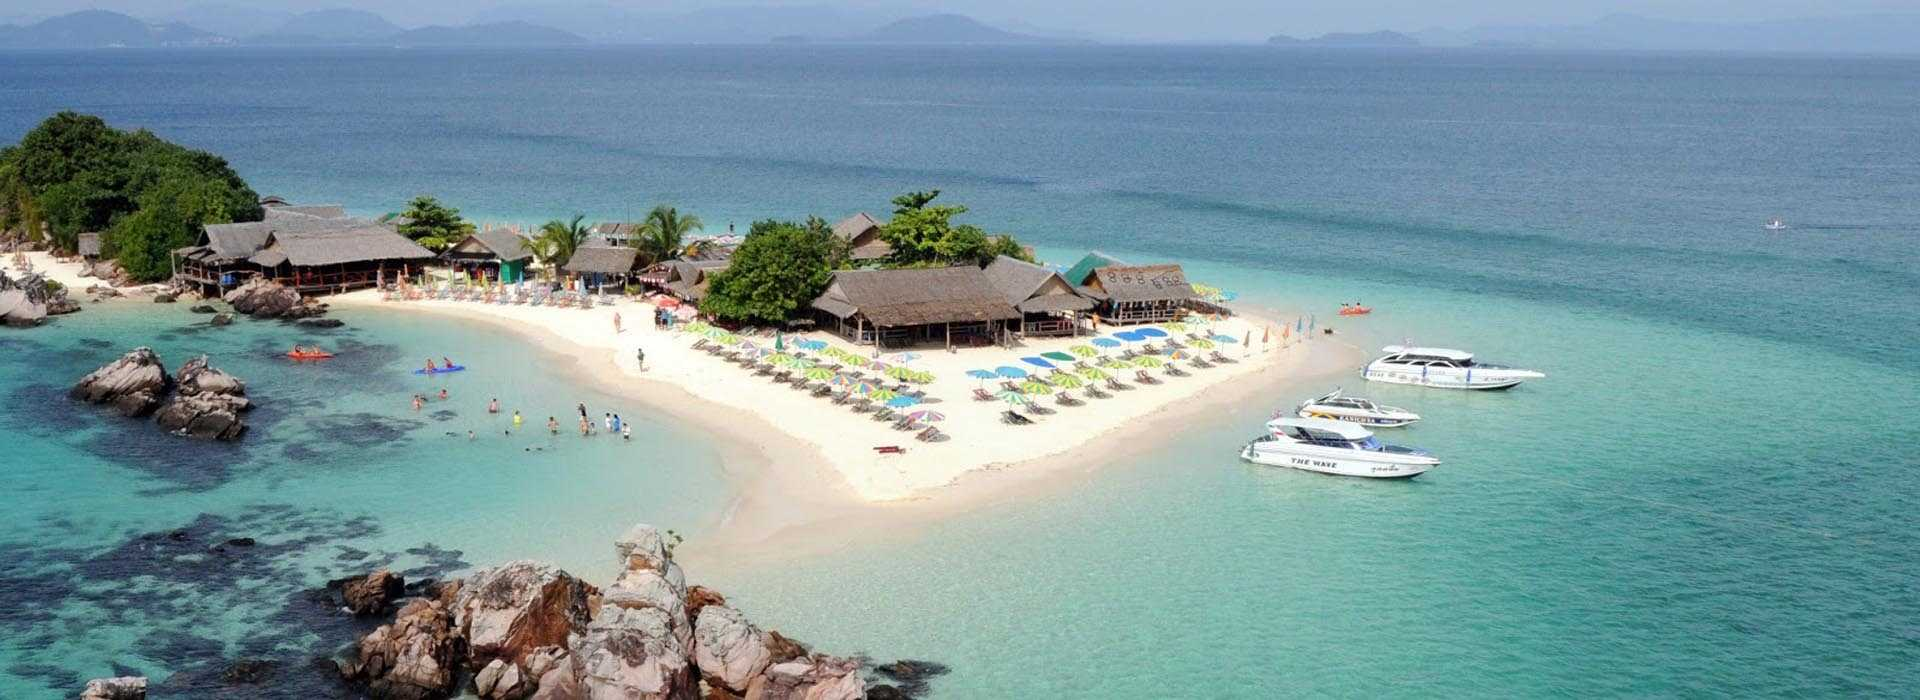 Transferotel Khai Island Ao Phang Nga National_Park